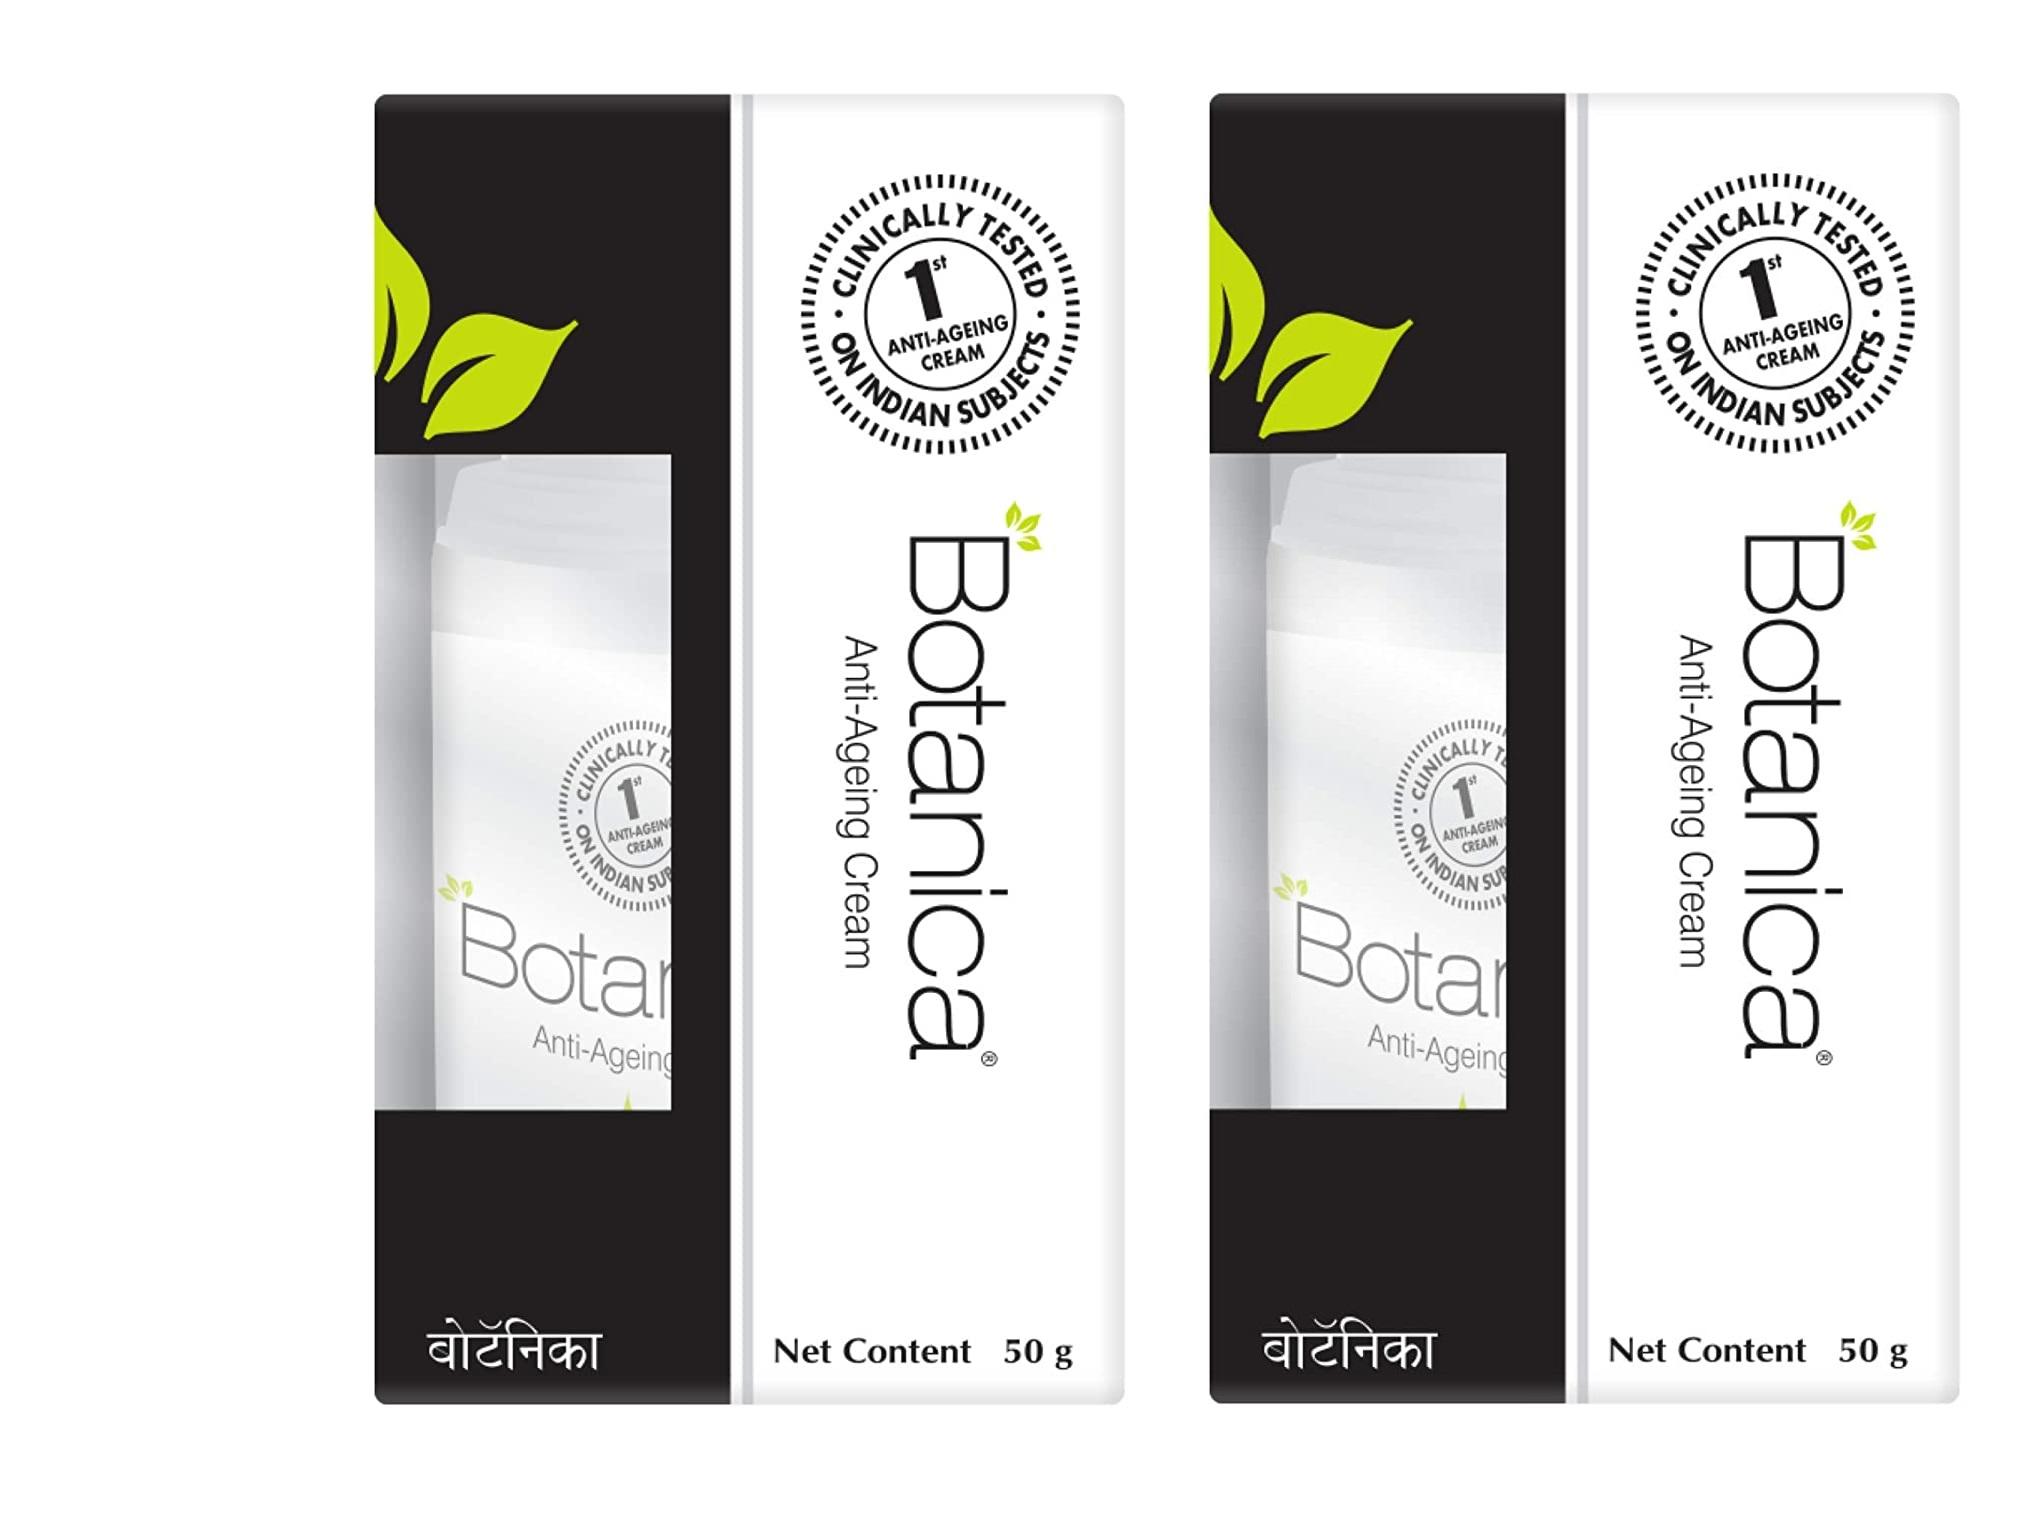 Botanica Anti Ageing Cream 50g Pack Of 2